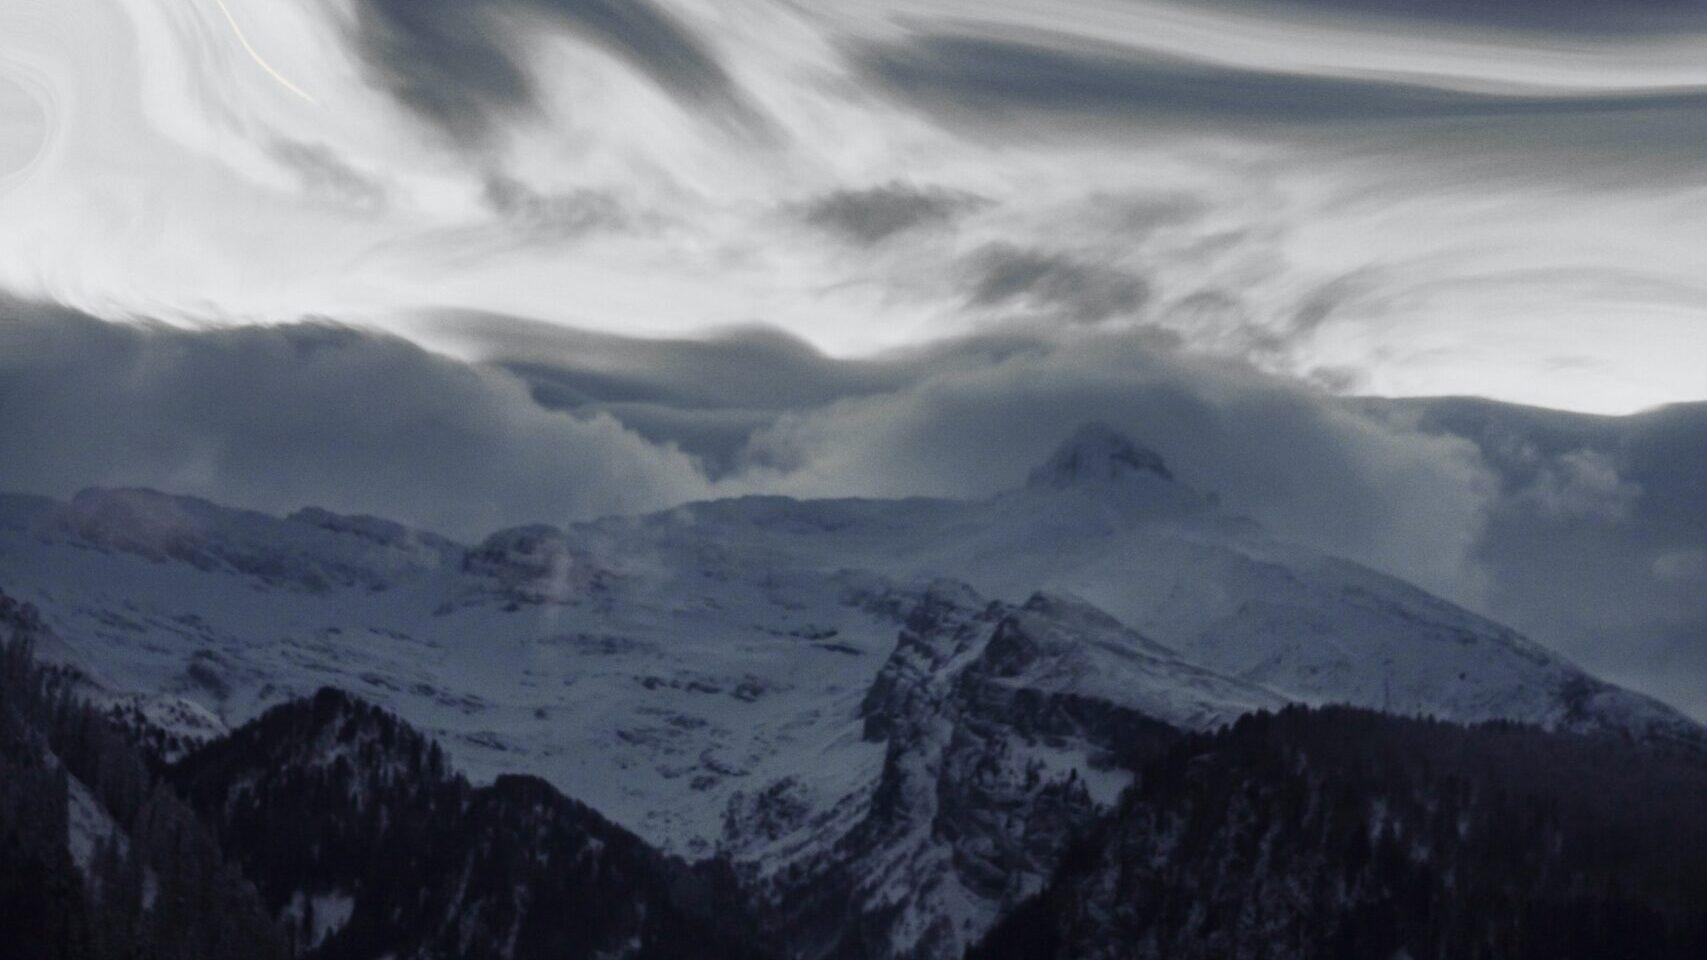 SURVIVOR AND SAVIOR - A Survivor's Diary from the Annapurna Blizzard October 2014